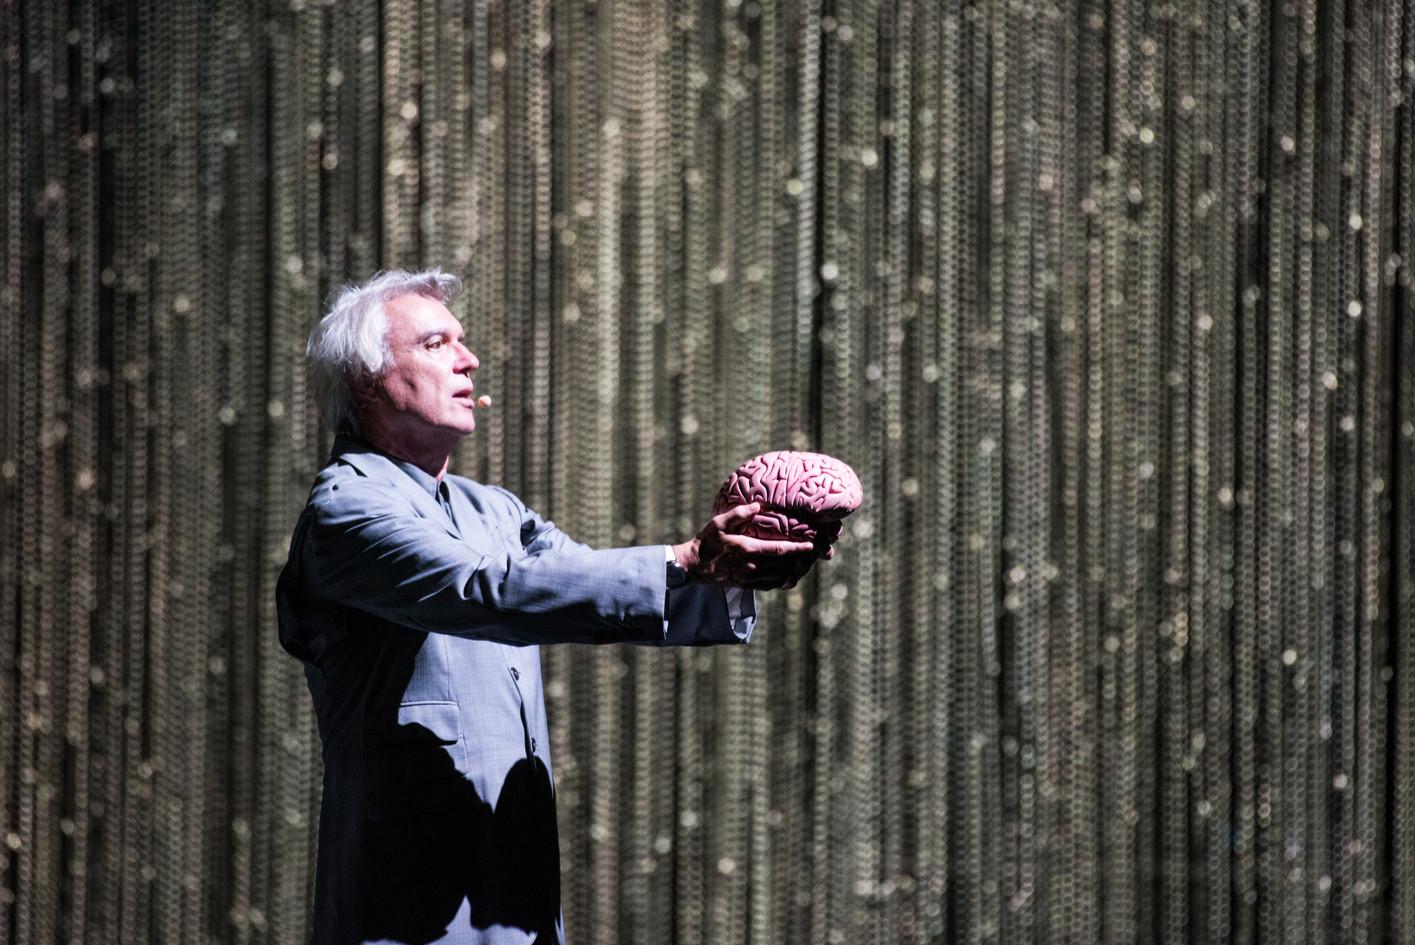 David Byrne at The Shrine Auditorium